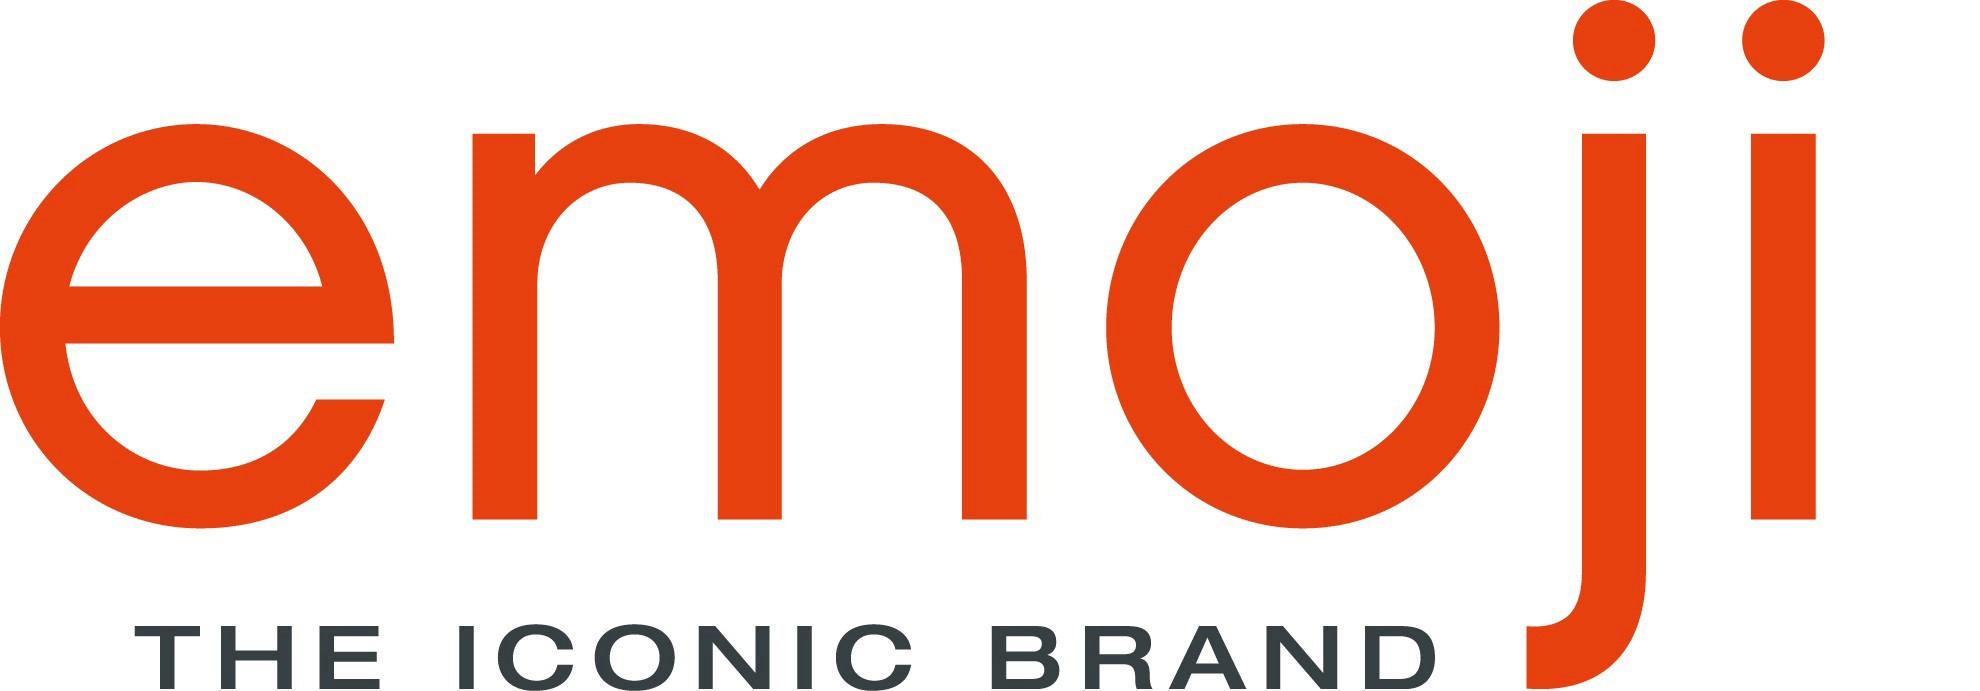 Emoji Company GmbH